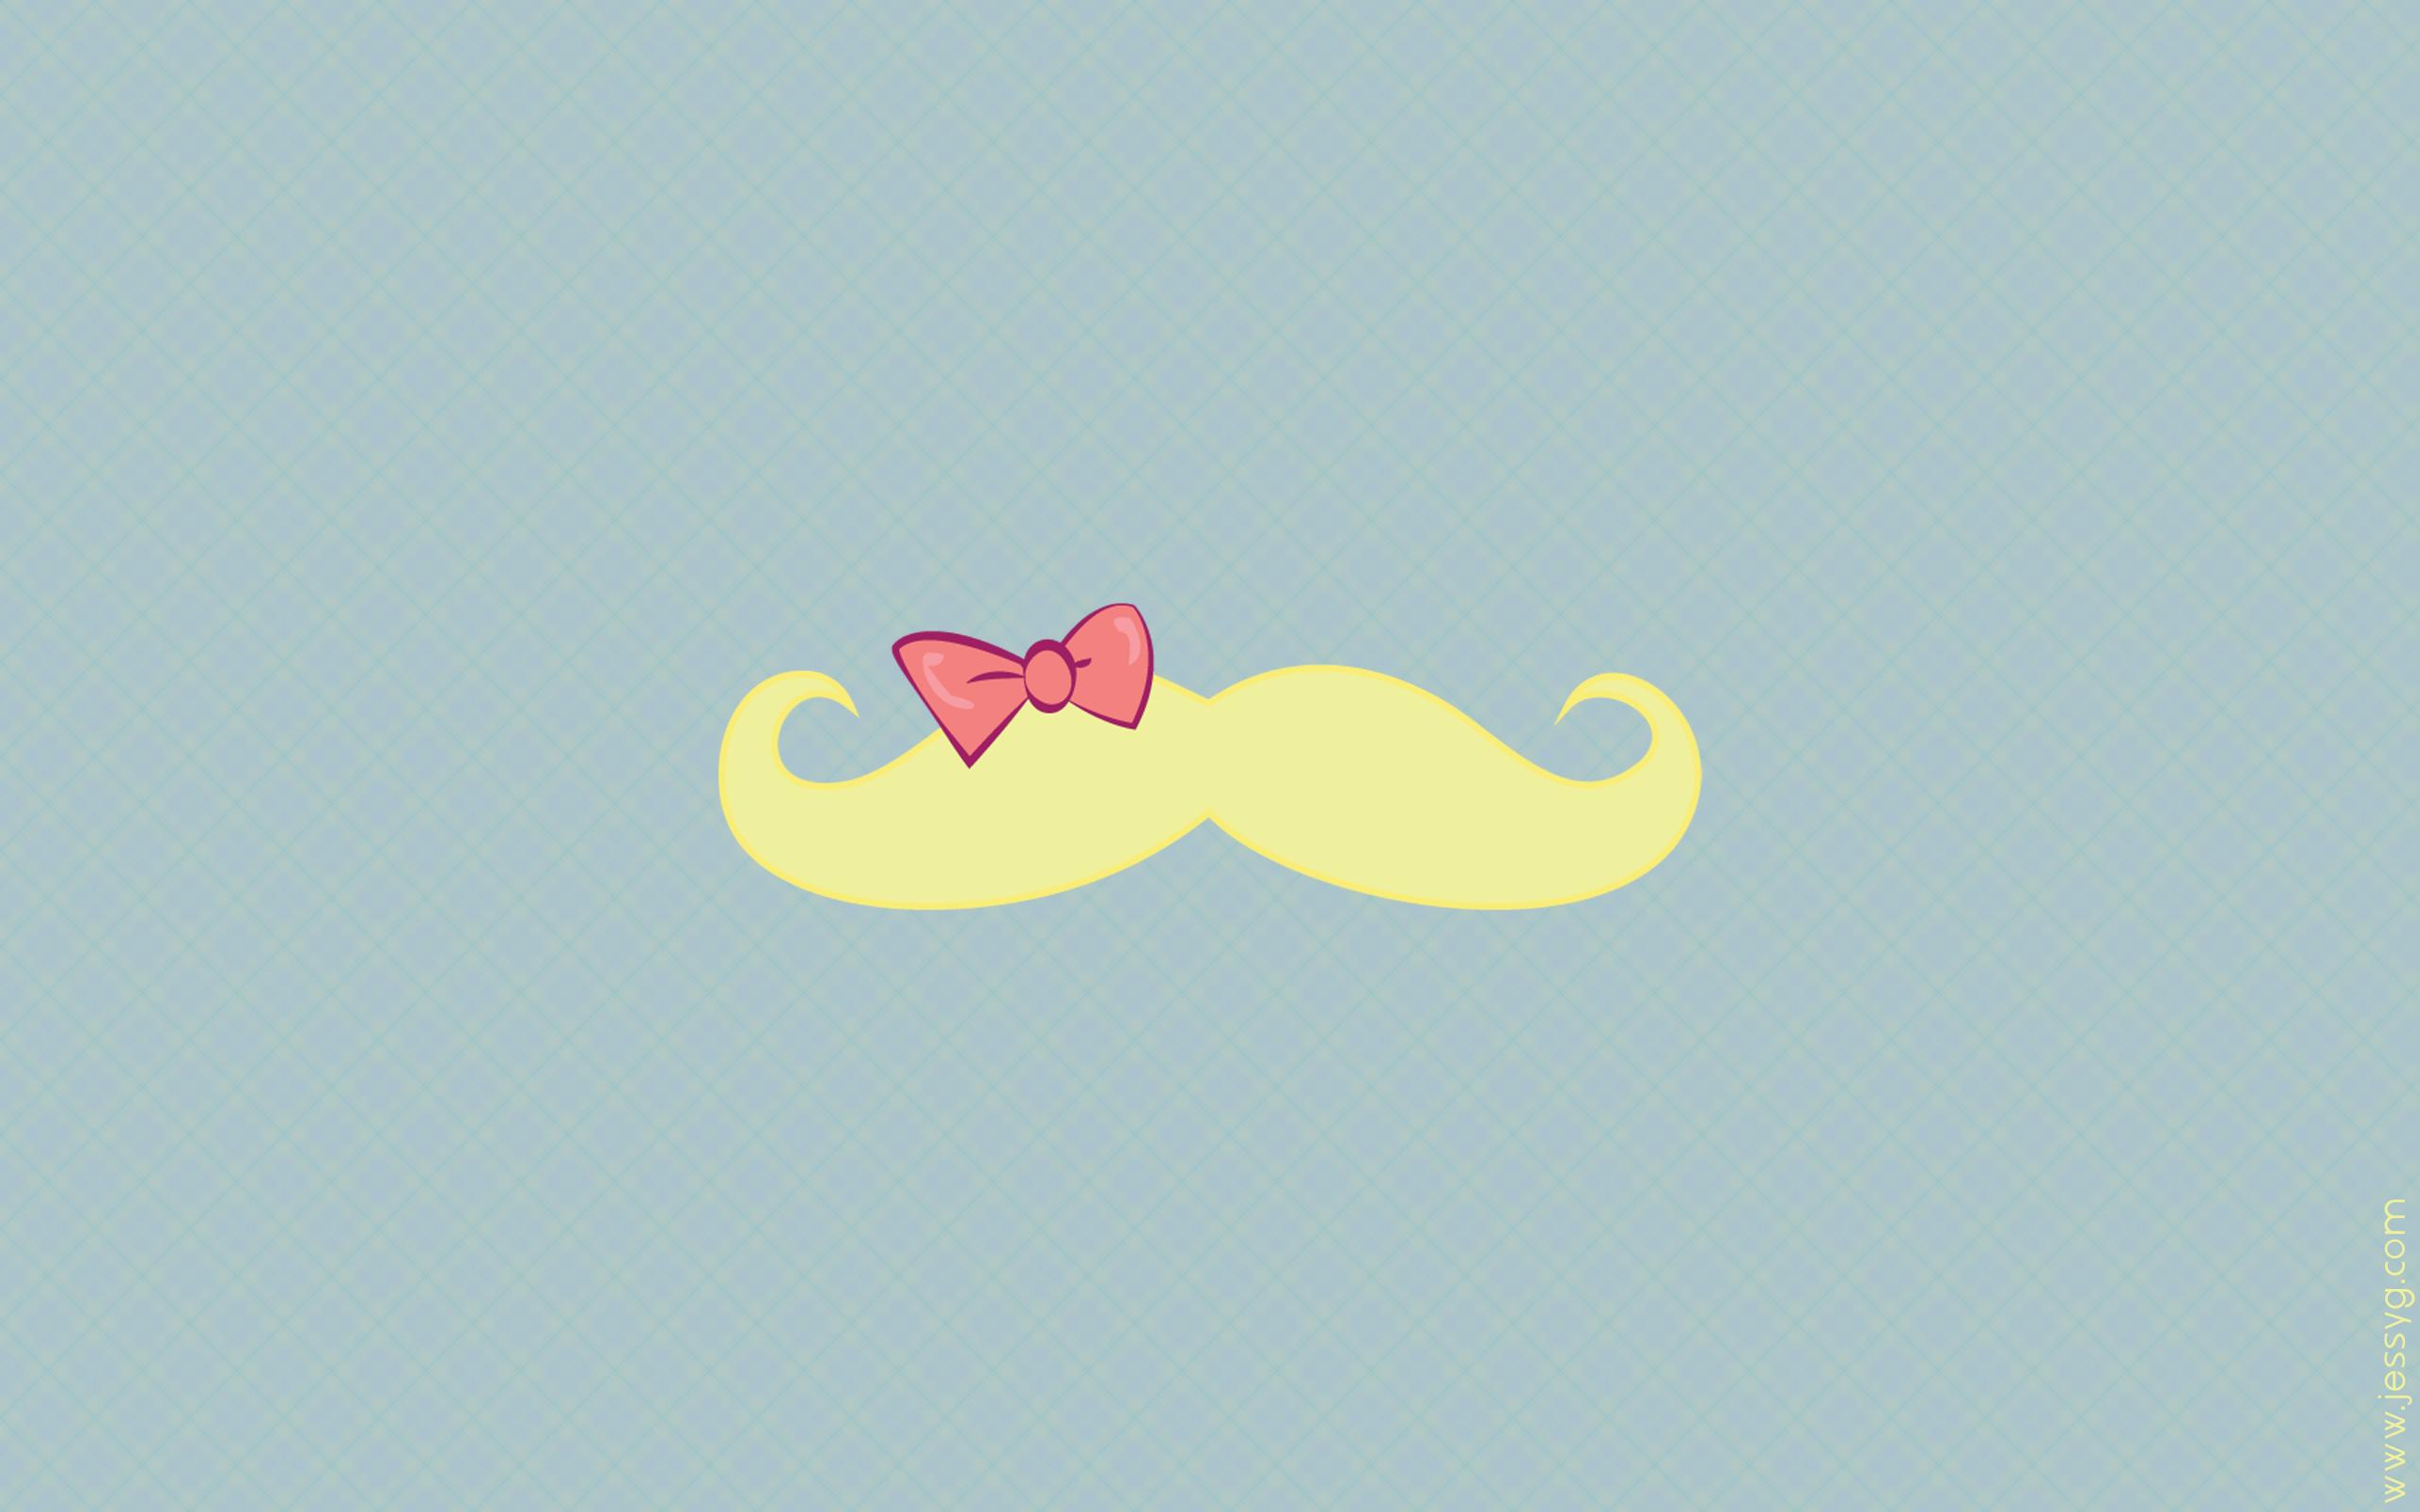 Mrs. Moustache Wallpaper by jessyG22 on